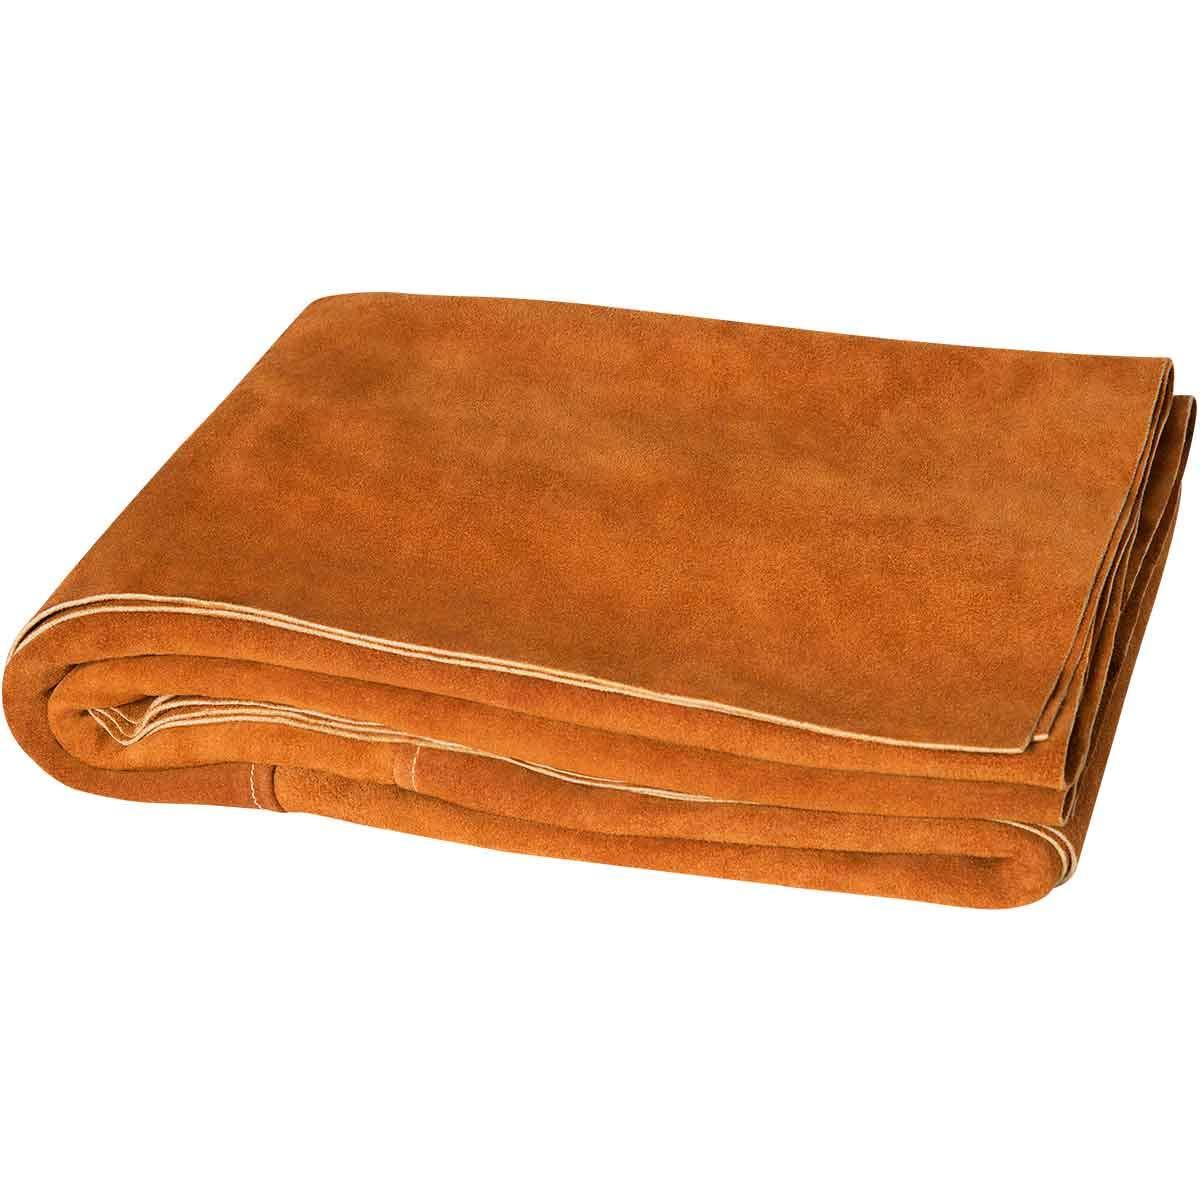 Steiner 321-6X6 Side Split Cowhide Leather Welding Blanket, 6' x 6' by Steiner